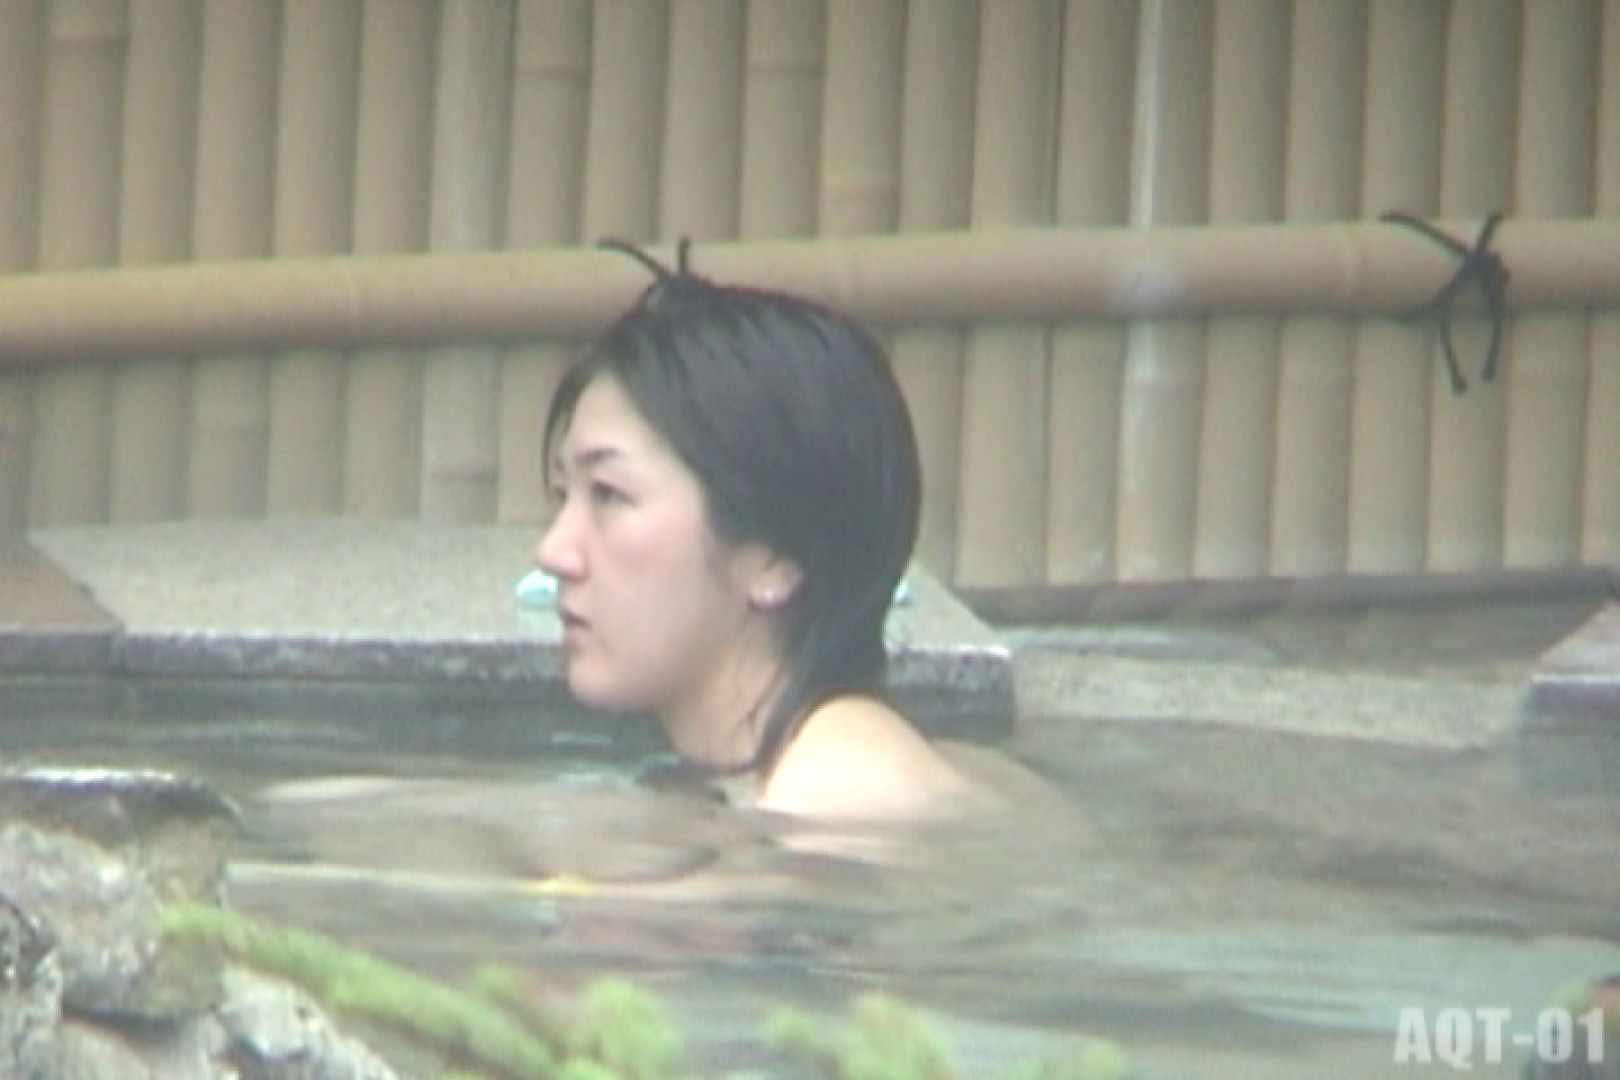 Aquaな露天風呂Vol.715 露天風呂 戯れ無修正画像 77連発 32